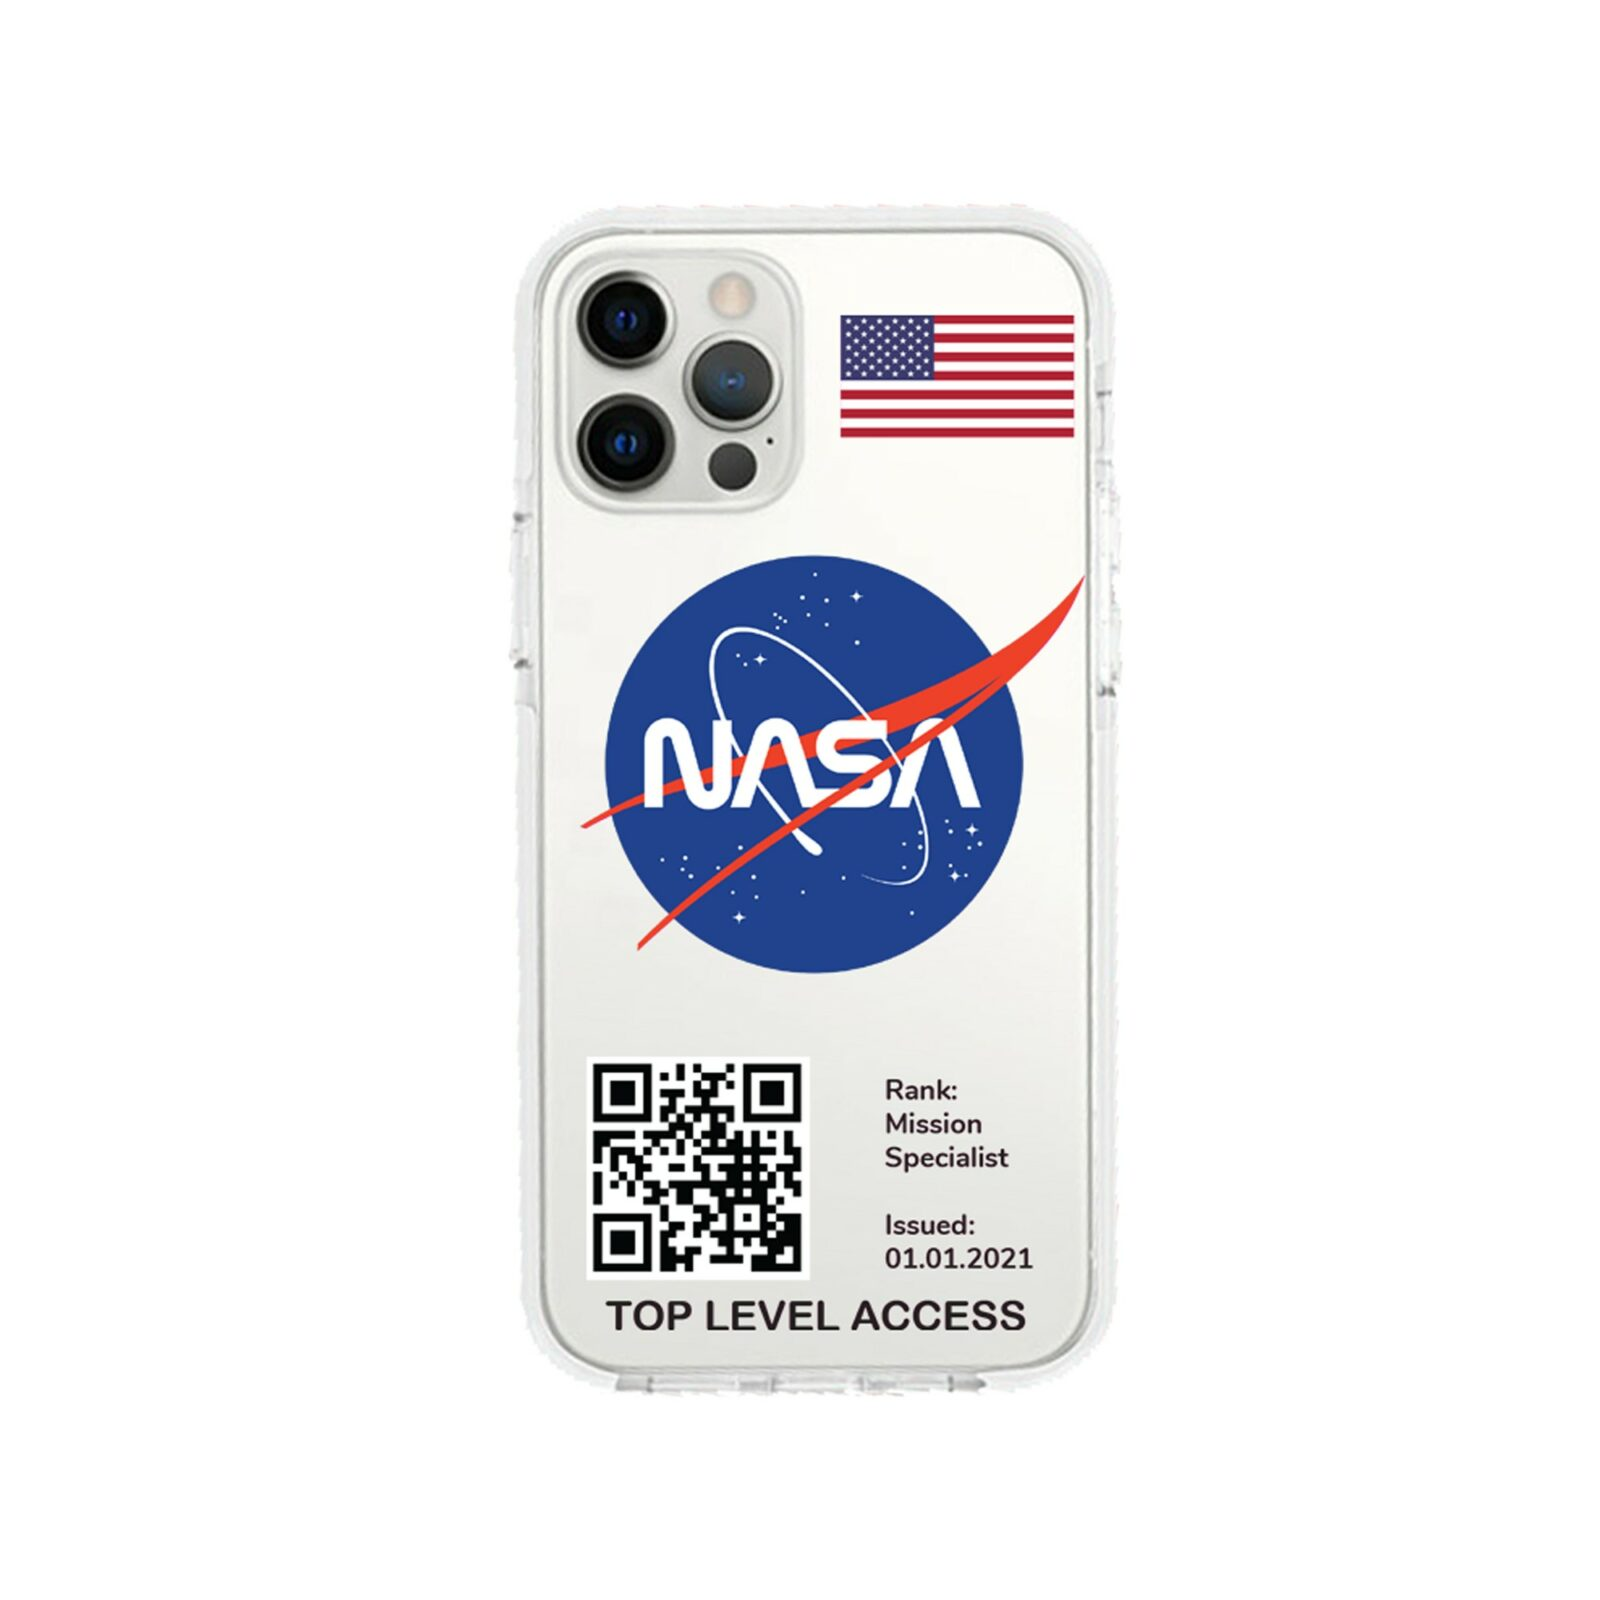 NASA Shockproof iPhone case